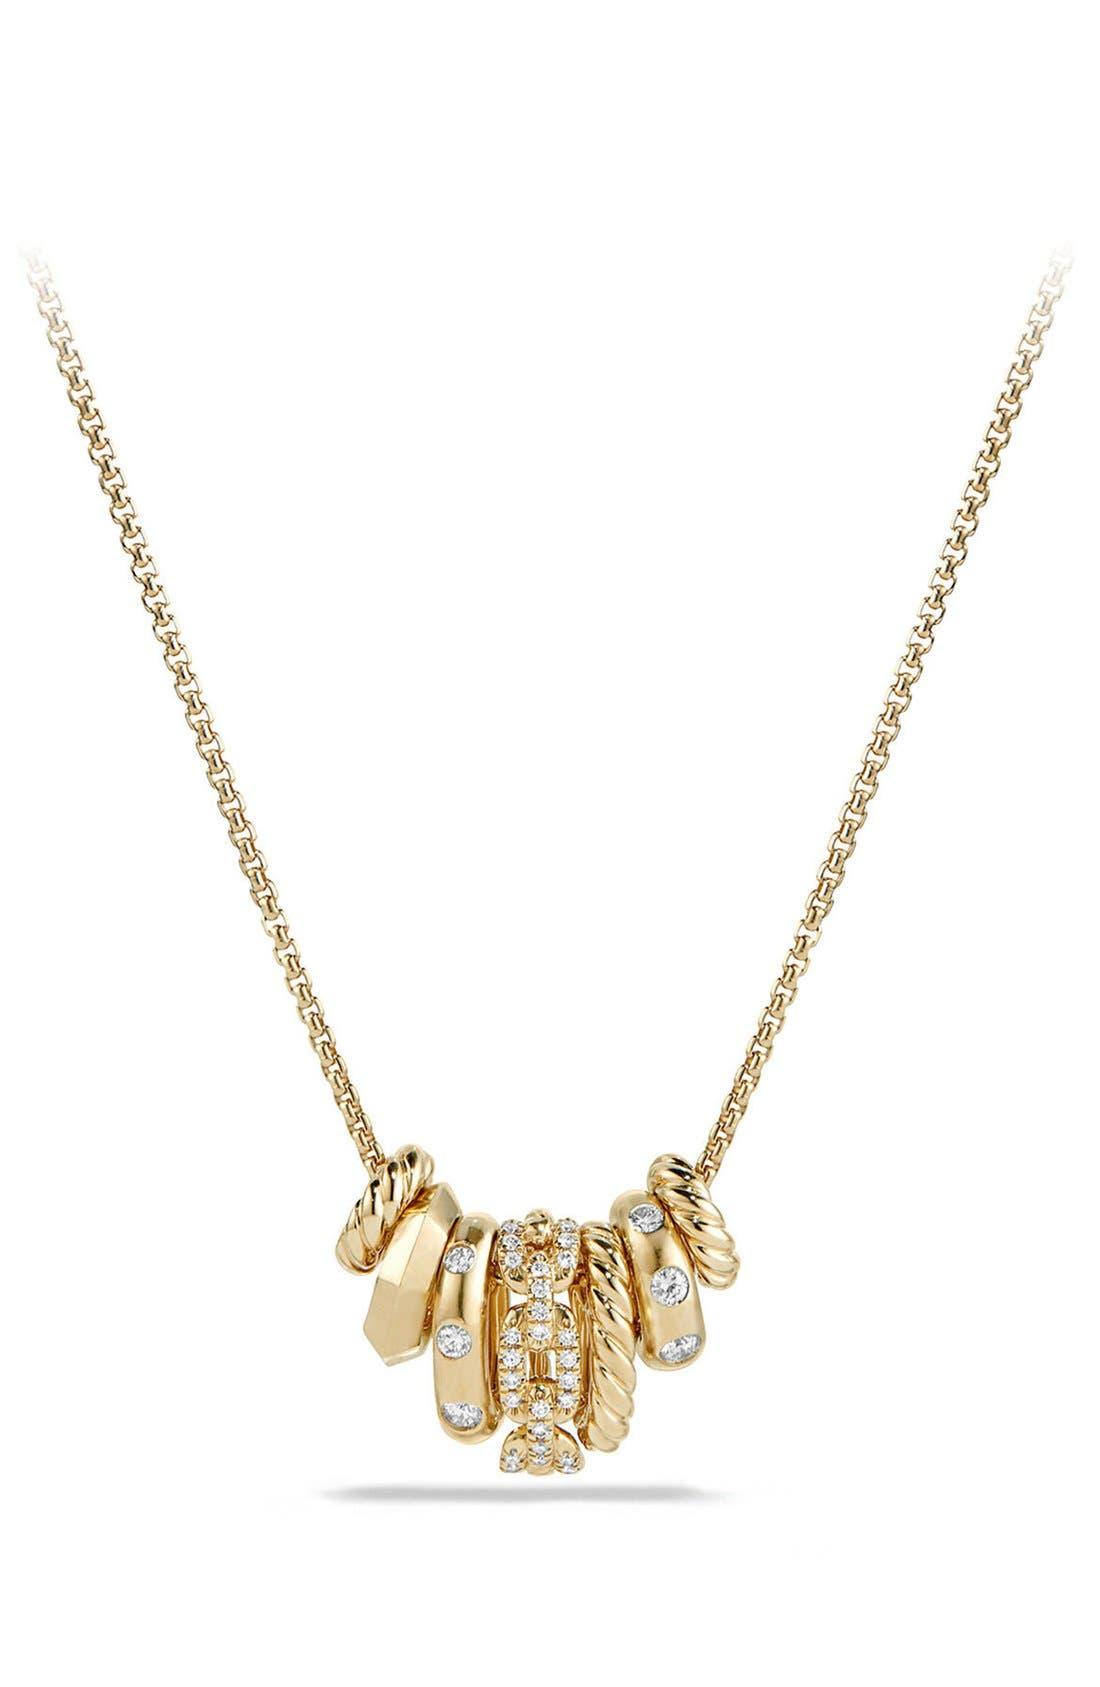 Main Image - David Yurman 'Stax' Pendant Necklace with Diamonds in 18K Gold